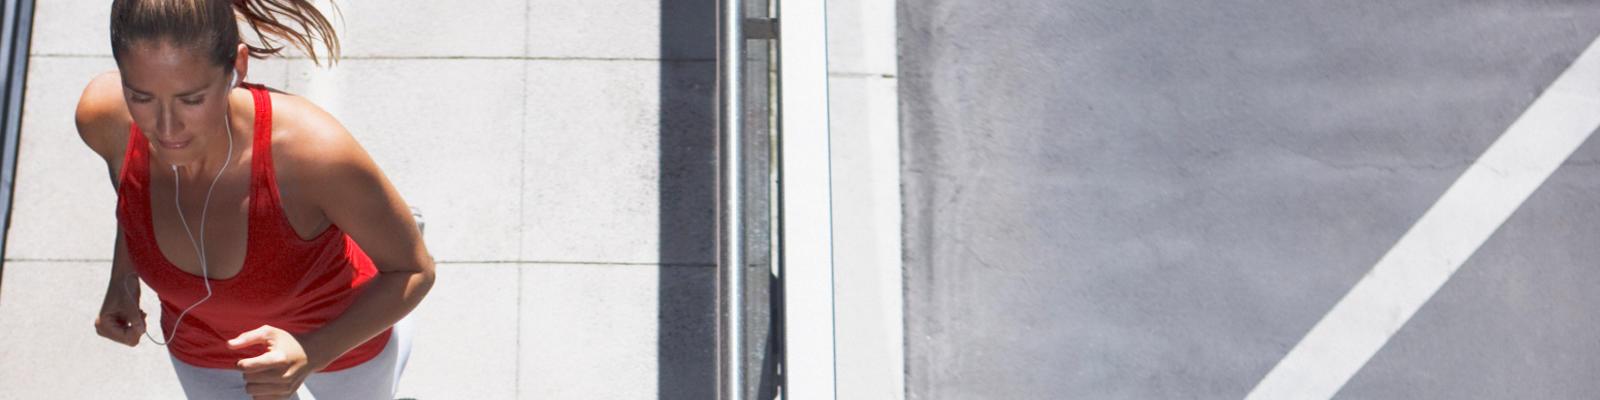 An overhead view of a woman running on a sidewalk